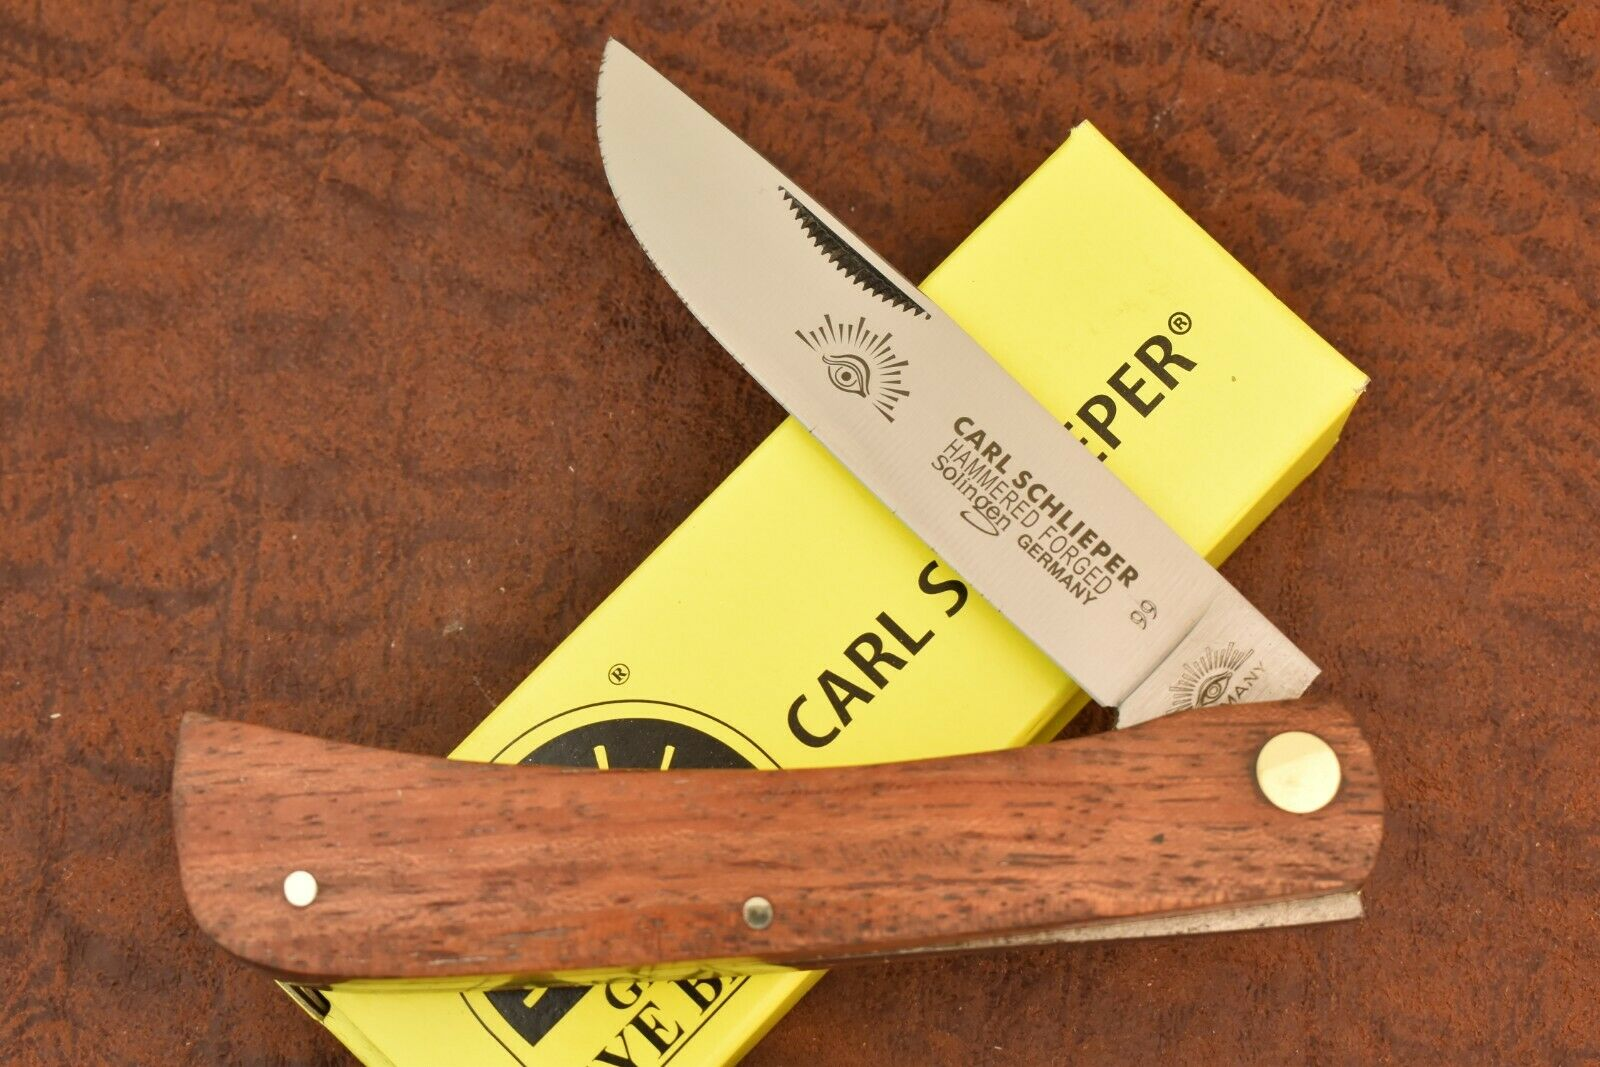 GERMAN EYE BRAND CARL SCHLIEPER JUMBO WOOD SODBUSTER KNIFE SOLINGEN GERMANY 8213